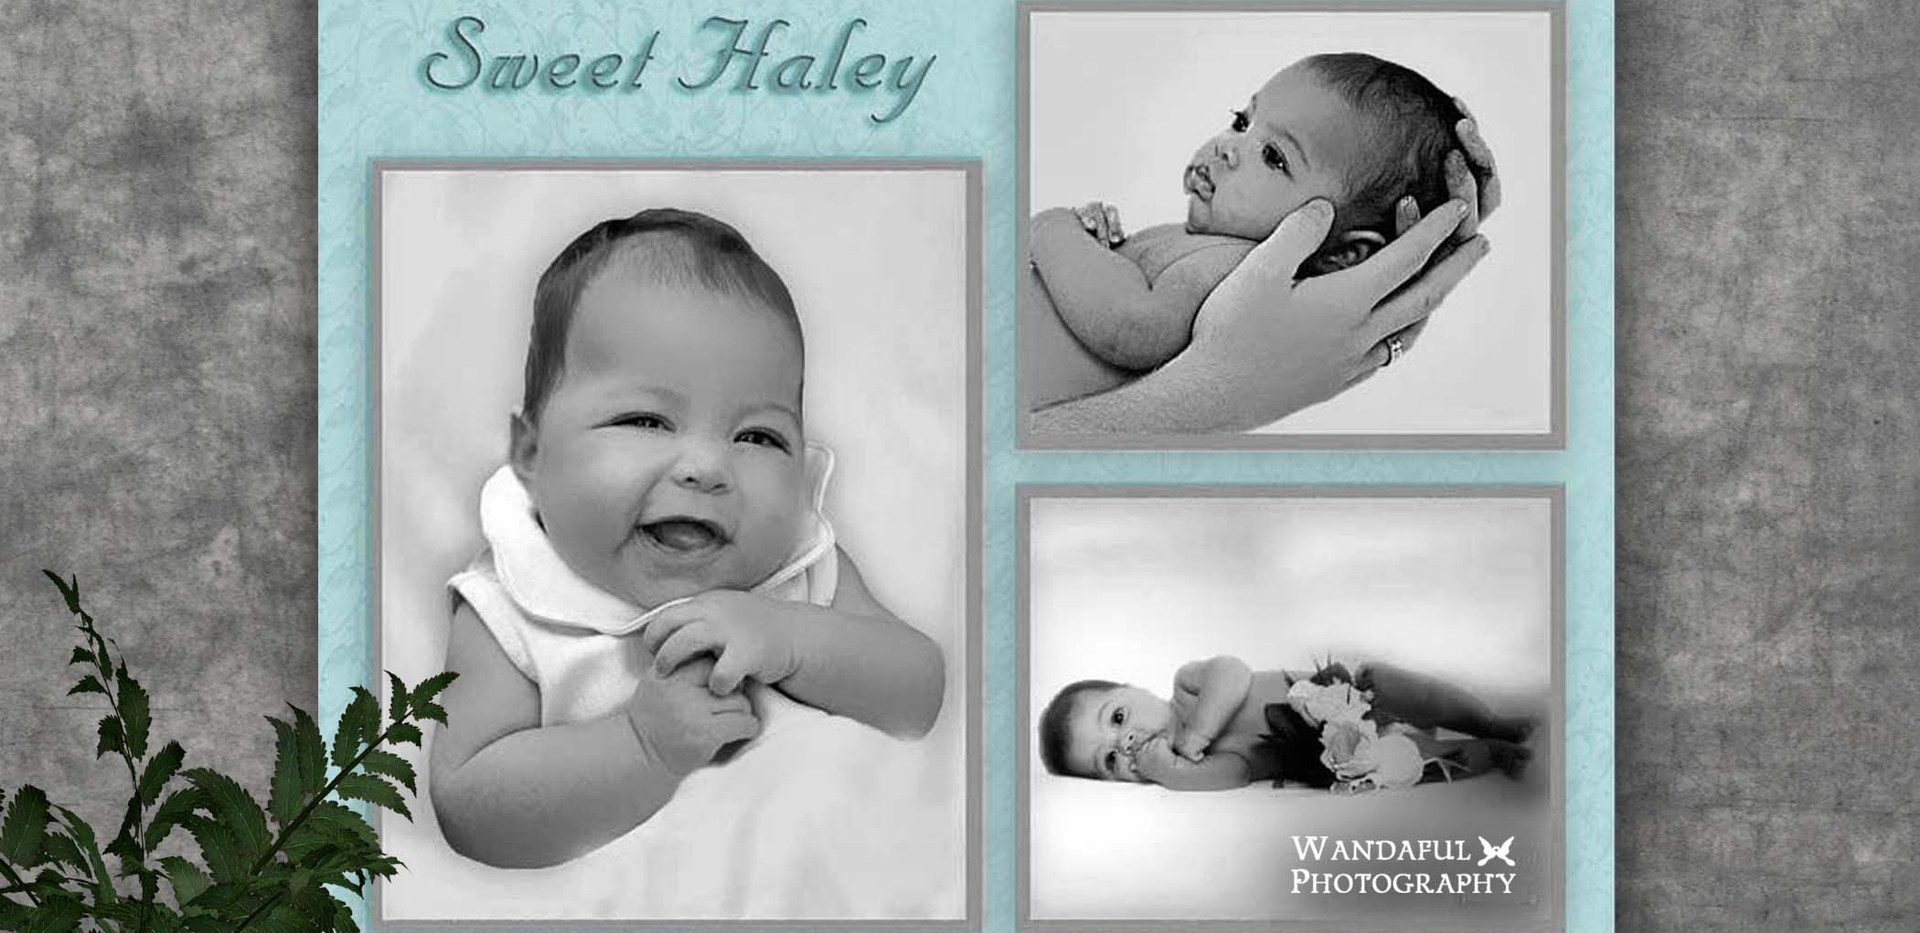 0 Sweet haley by Wp.jpg